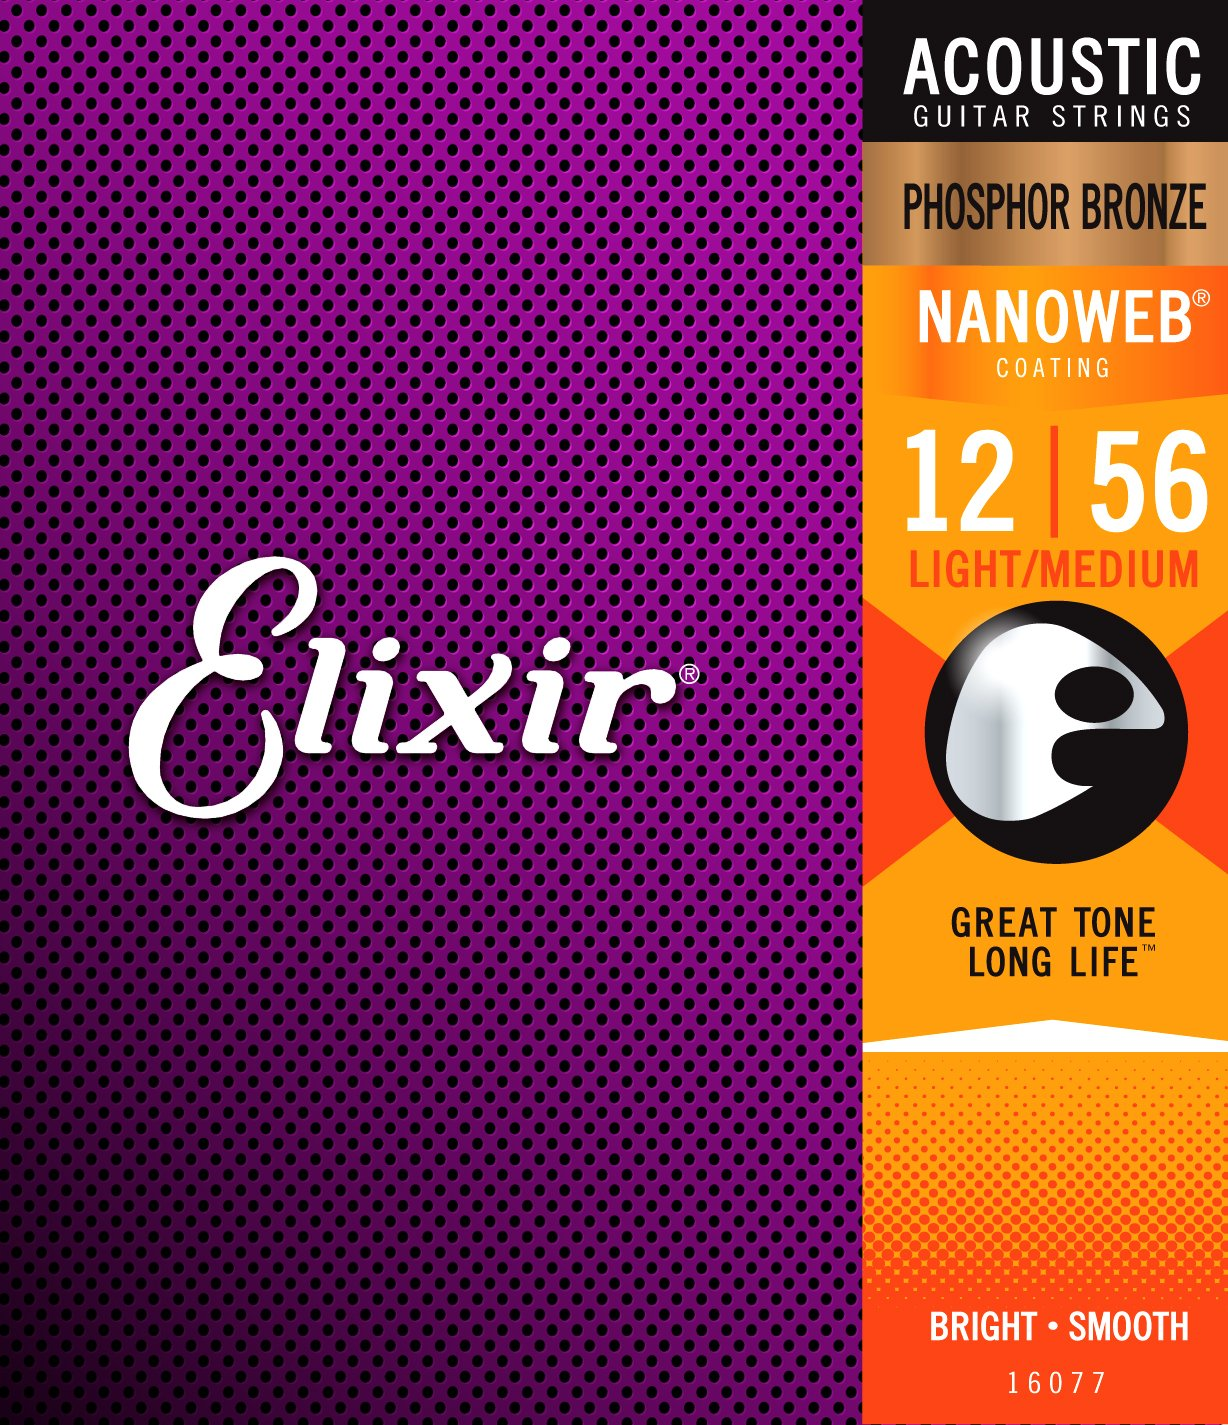 Elixir Acoustic Nano Phosphor Bronze Light/Medium 12-56 16077